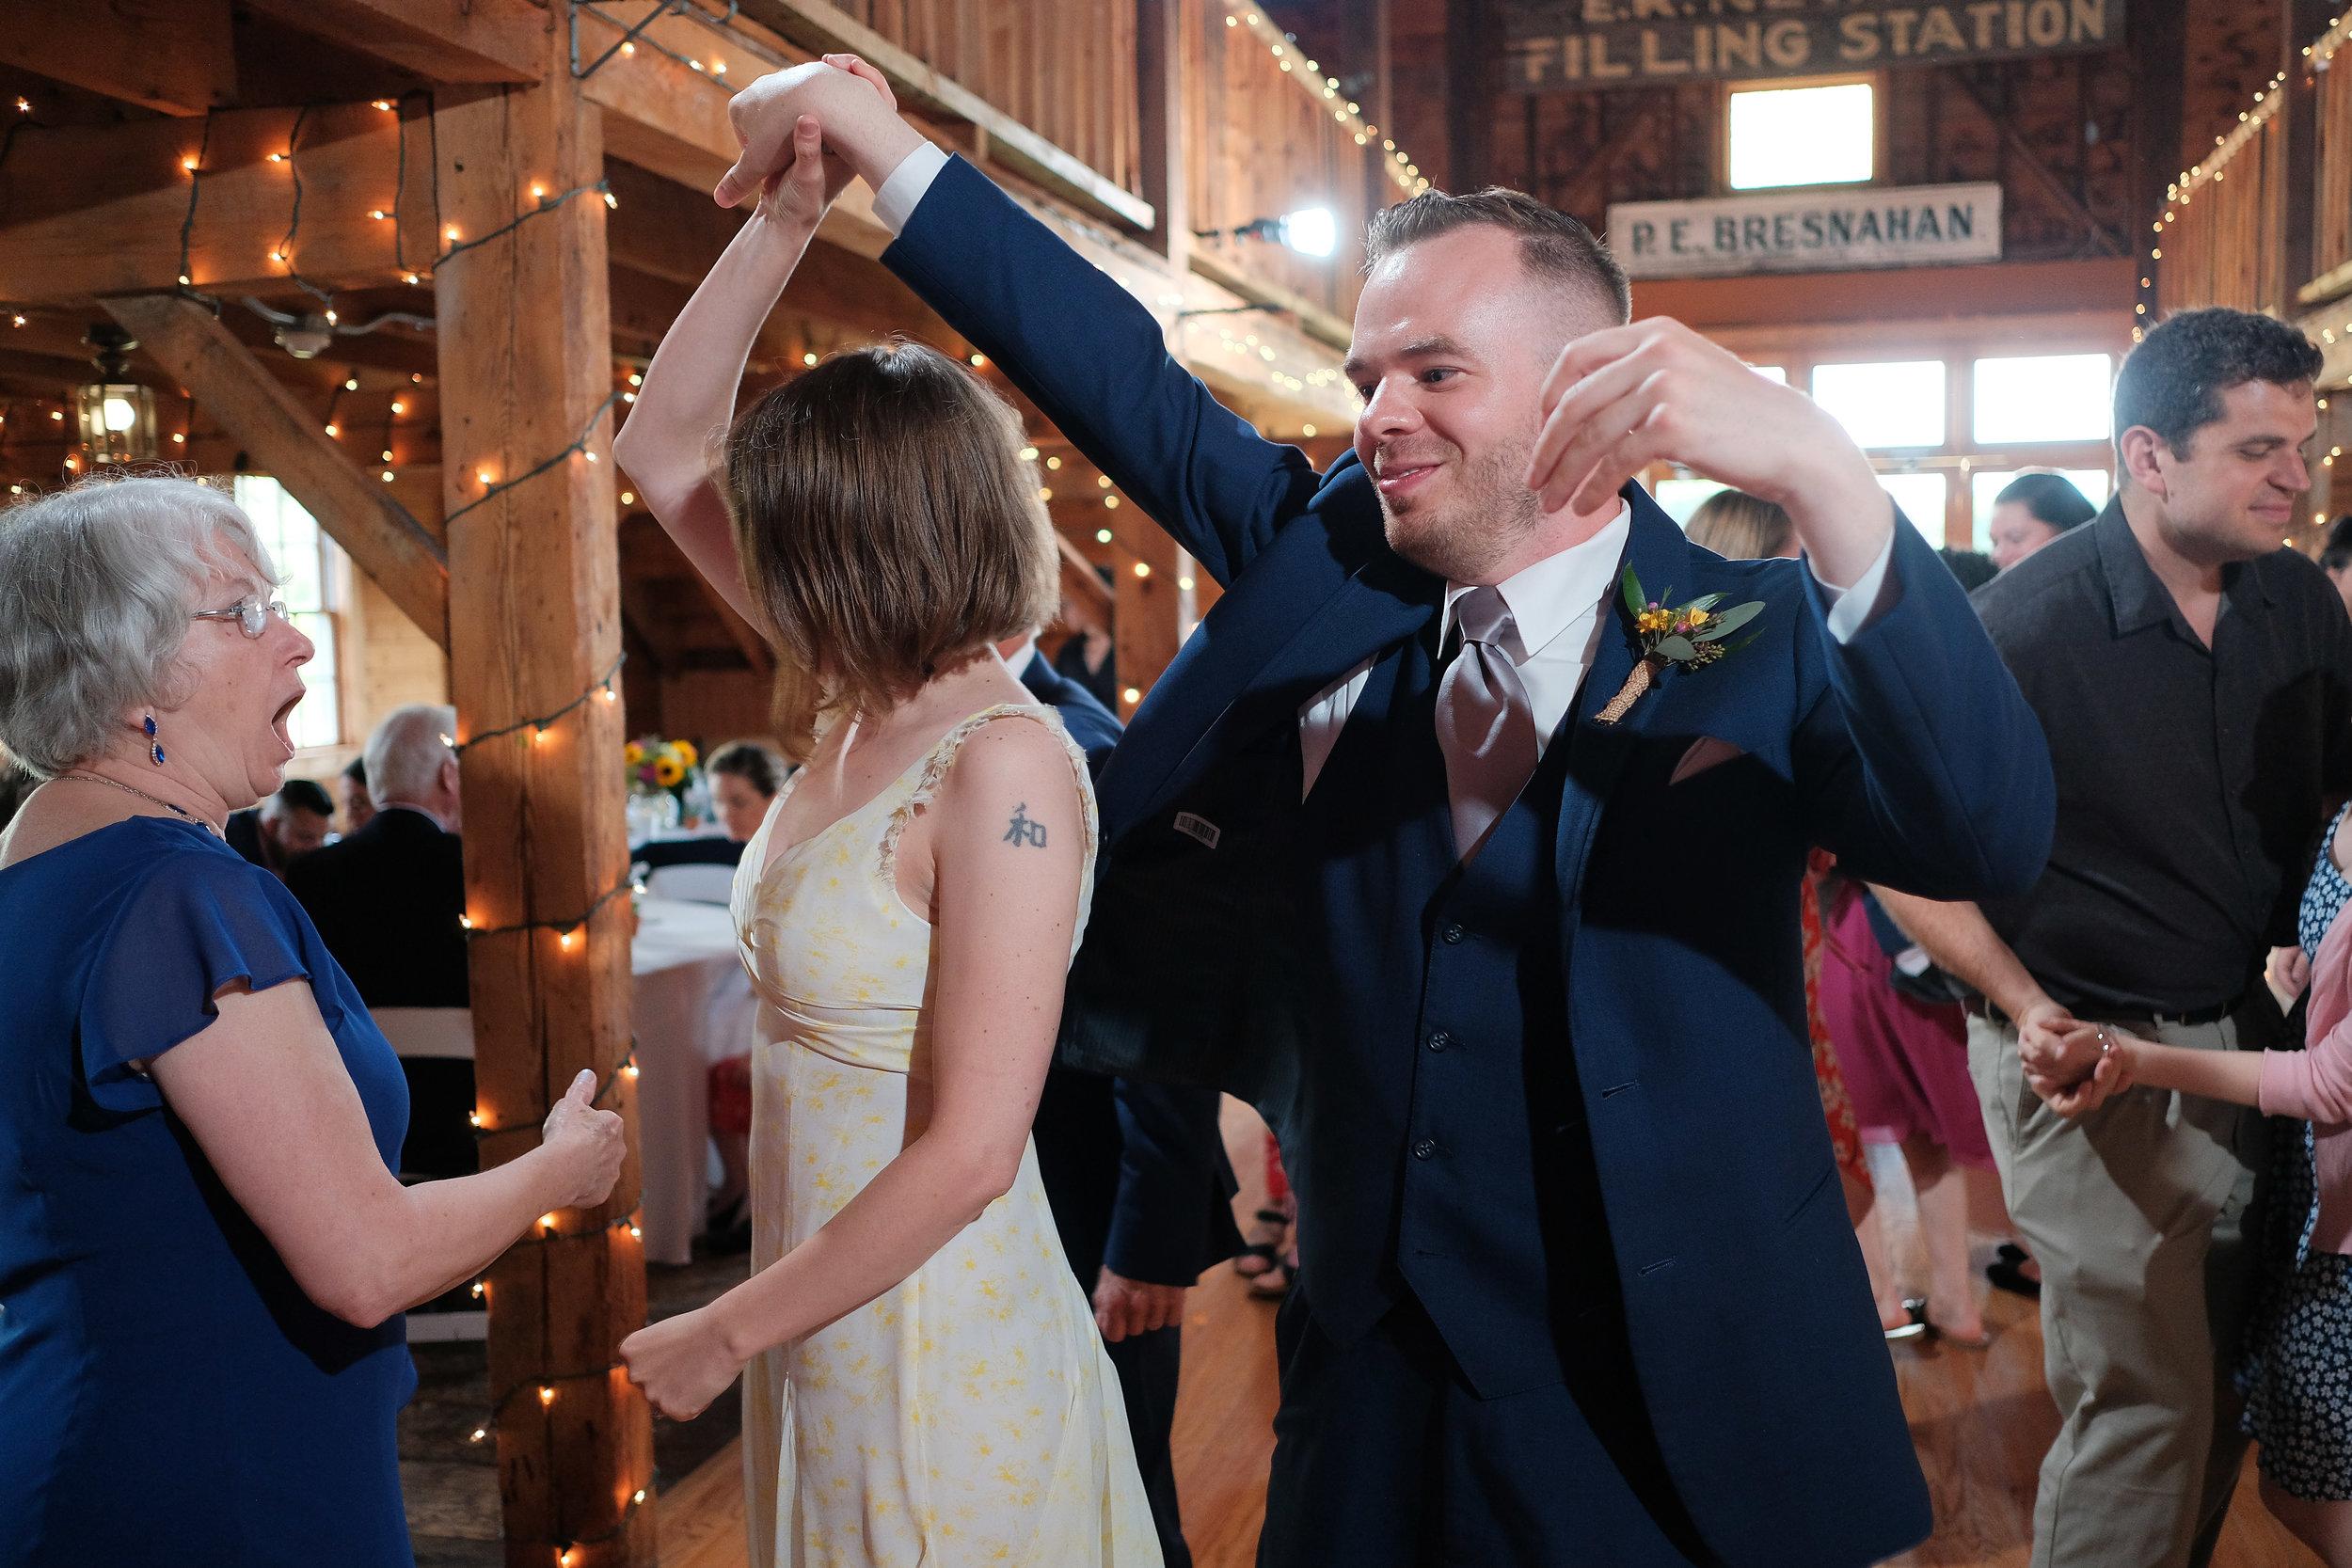 Peabody-Smith-Barn-Wedding-Photography-45.jpg